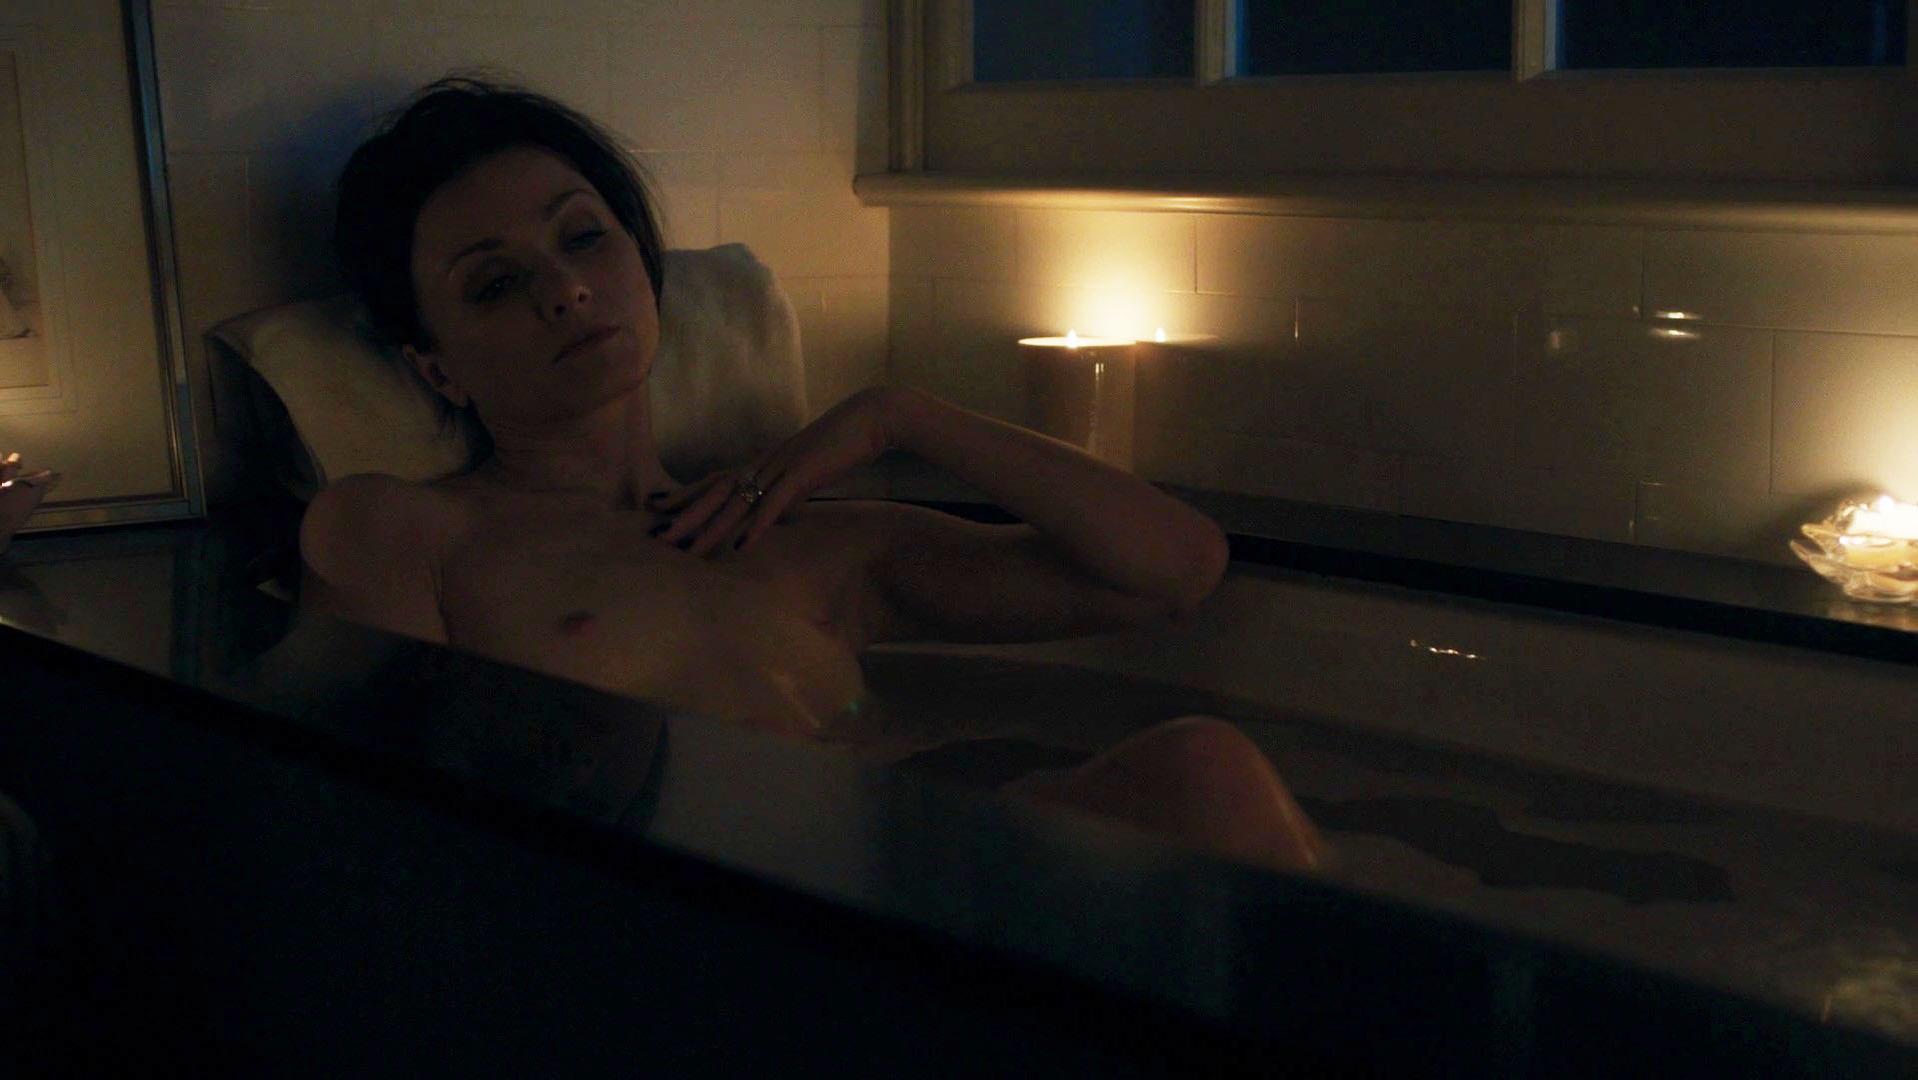 Irina Dvorovenko nude - Flesh and Bone s01e05 (2015)